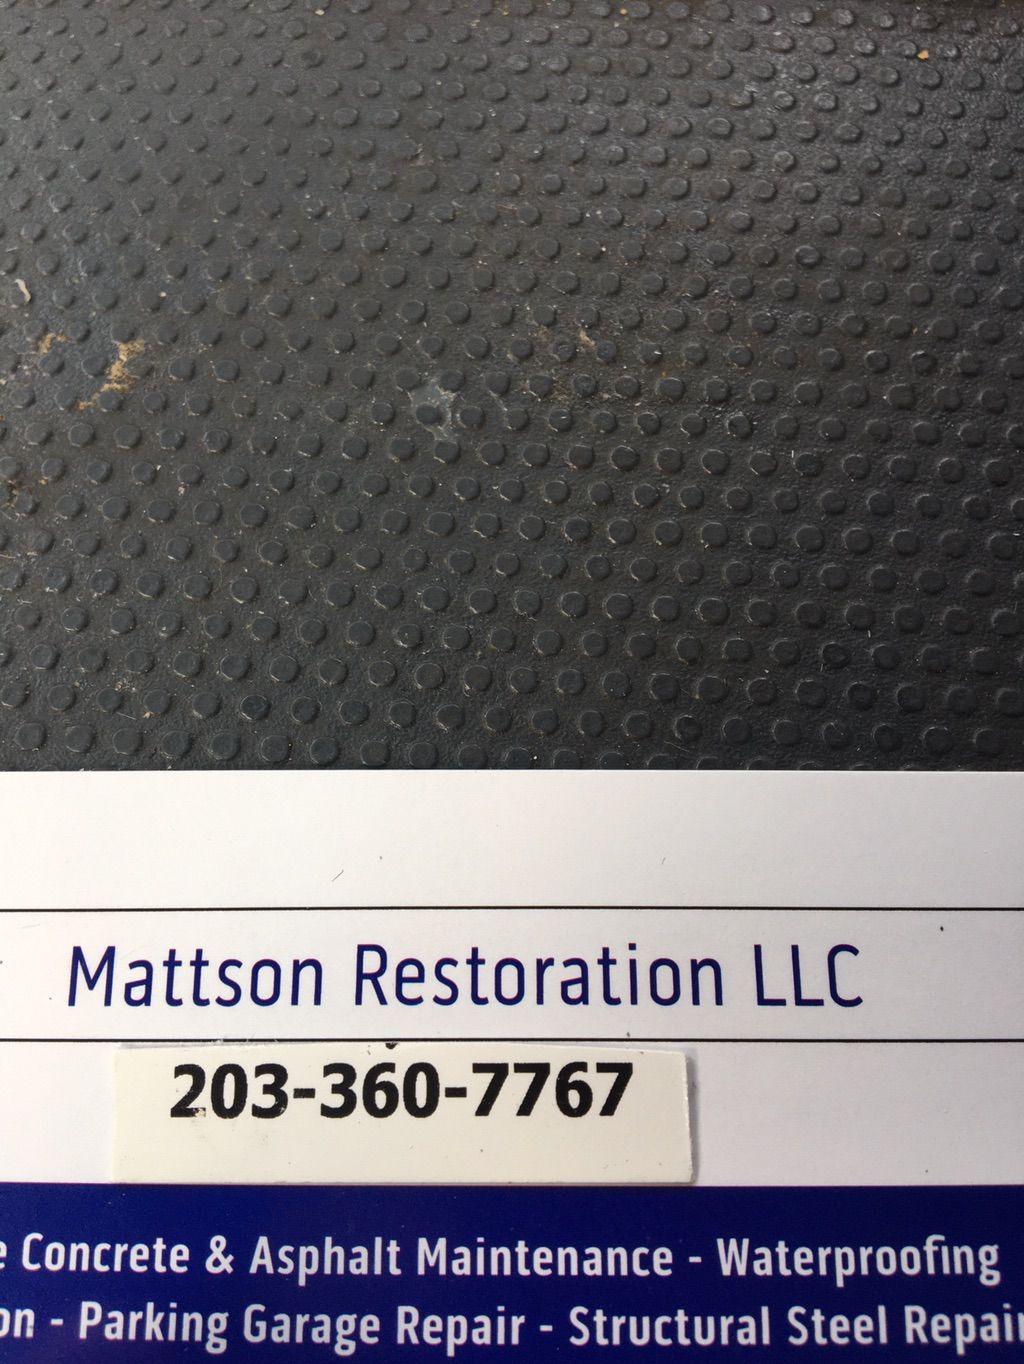 Mattson Restoration LLC